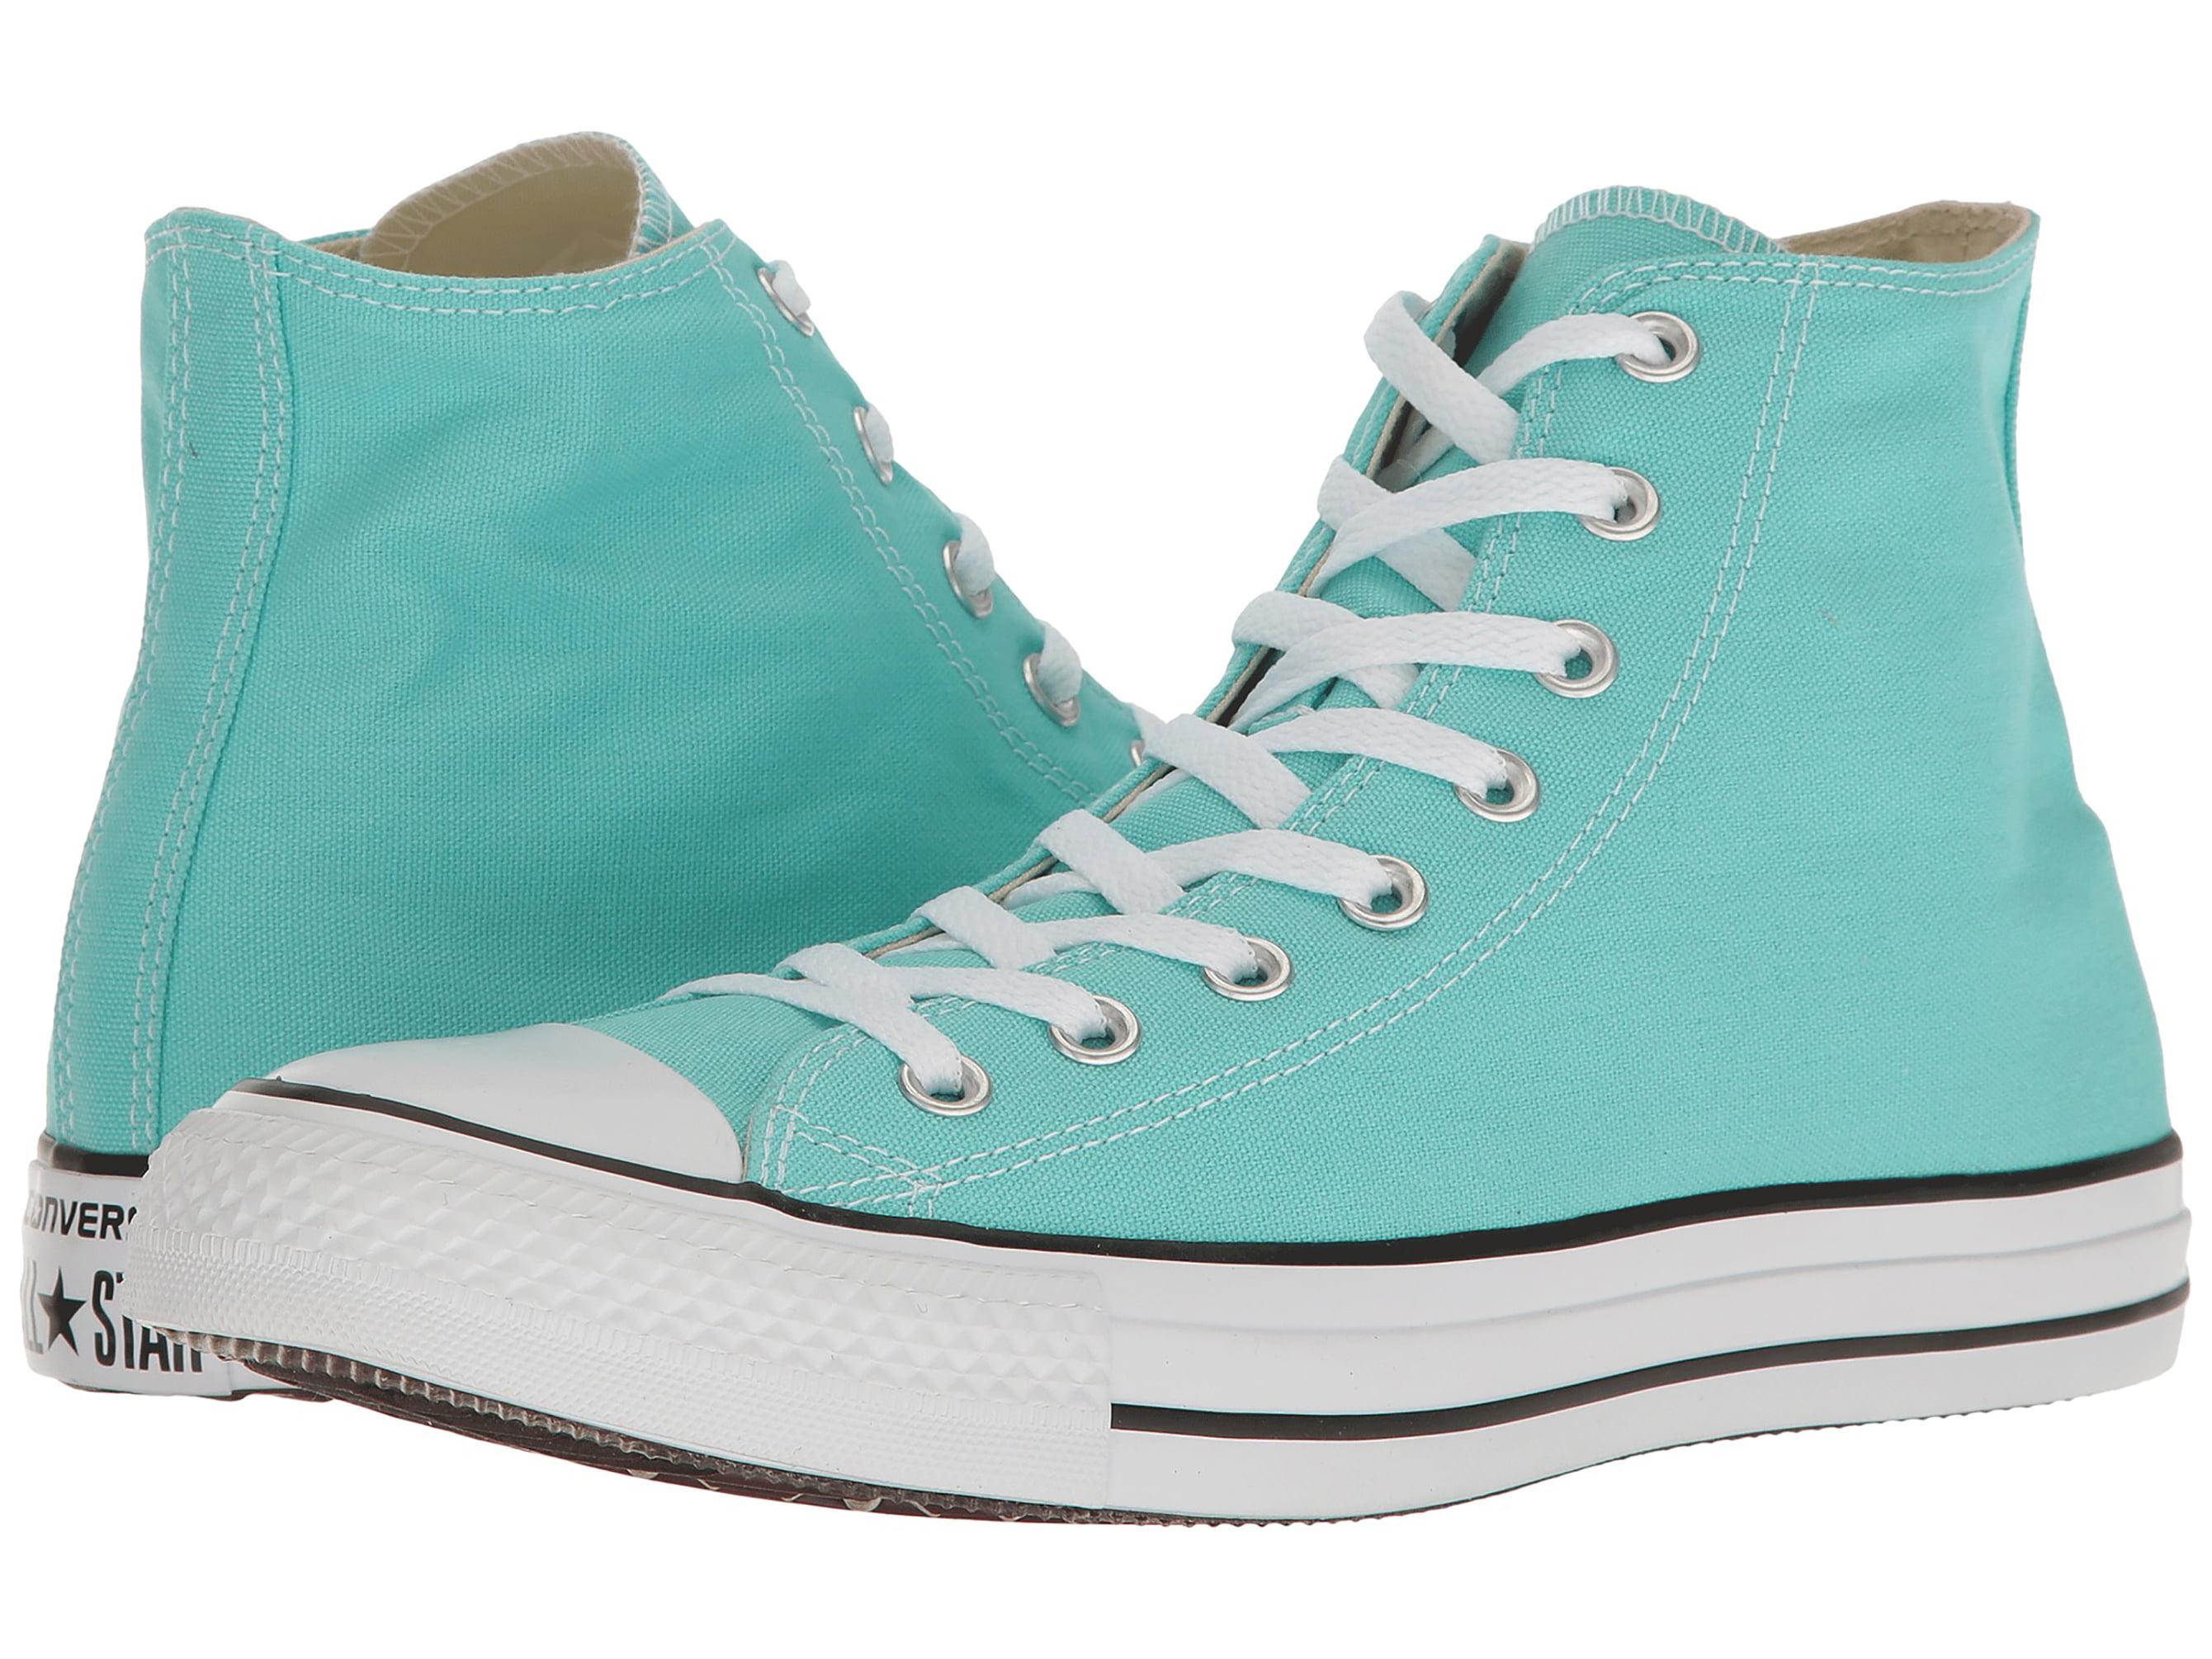 Converse Chuck Taylor All Star Hi Fashion Shoe, Raw Sugar Men's Size 11.5 by Converse